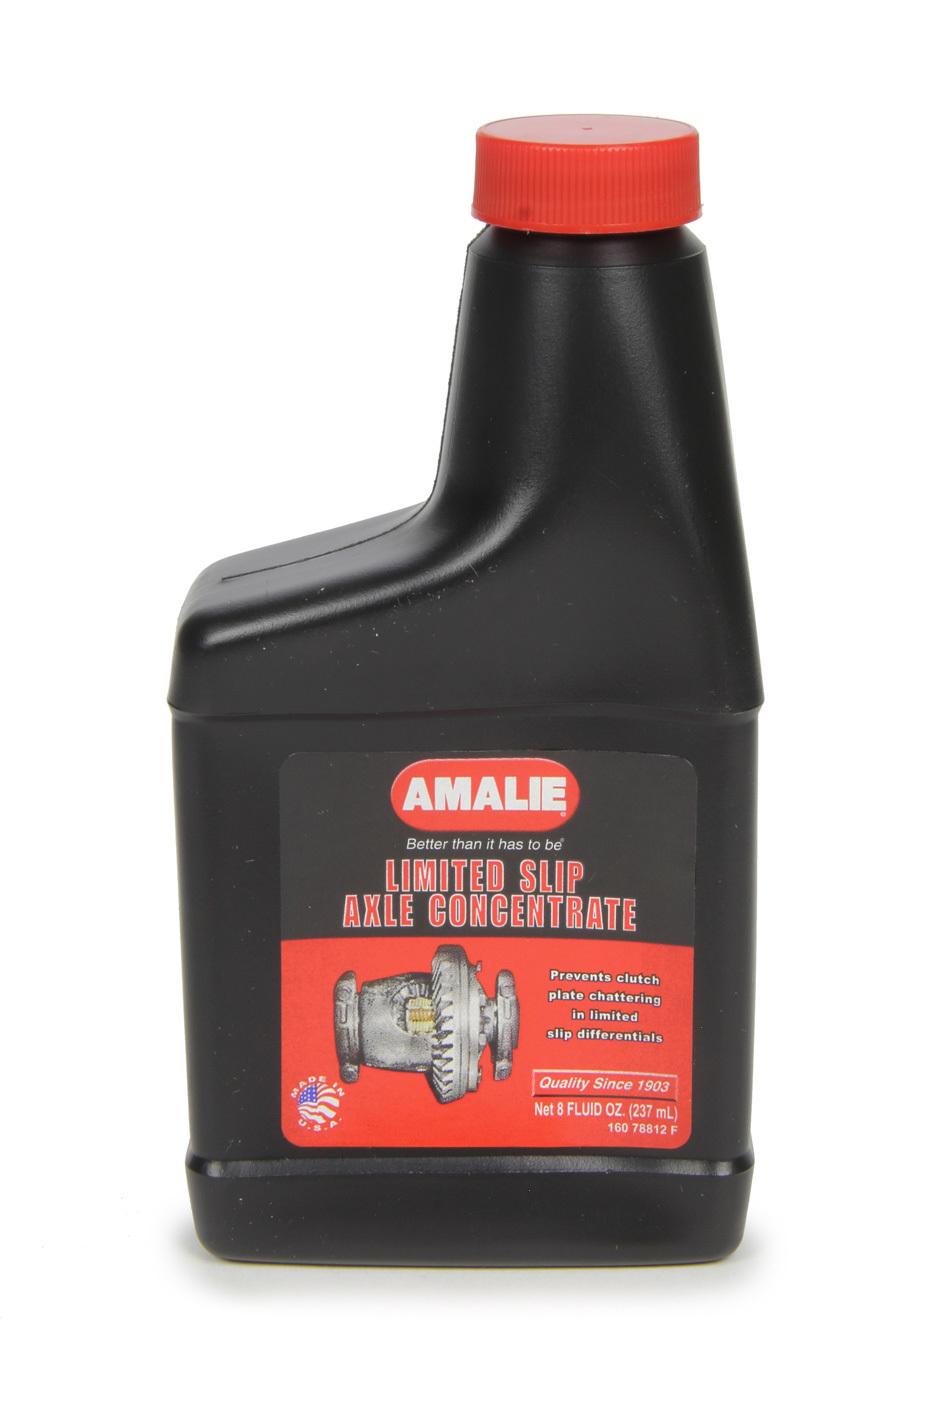 Amalie Limited Slip Axle Concen trate Case 8 Oz.